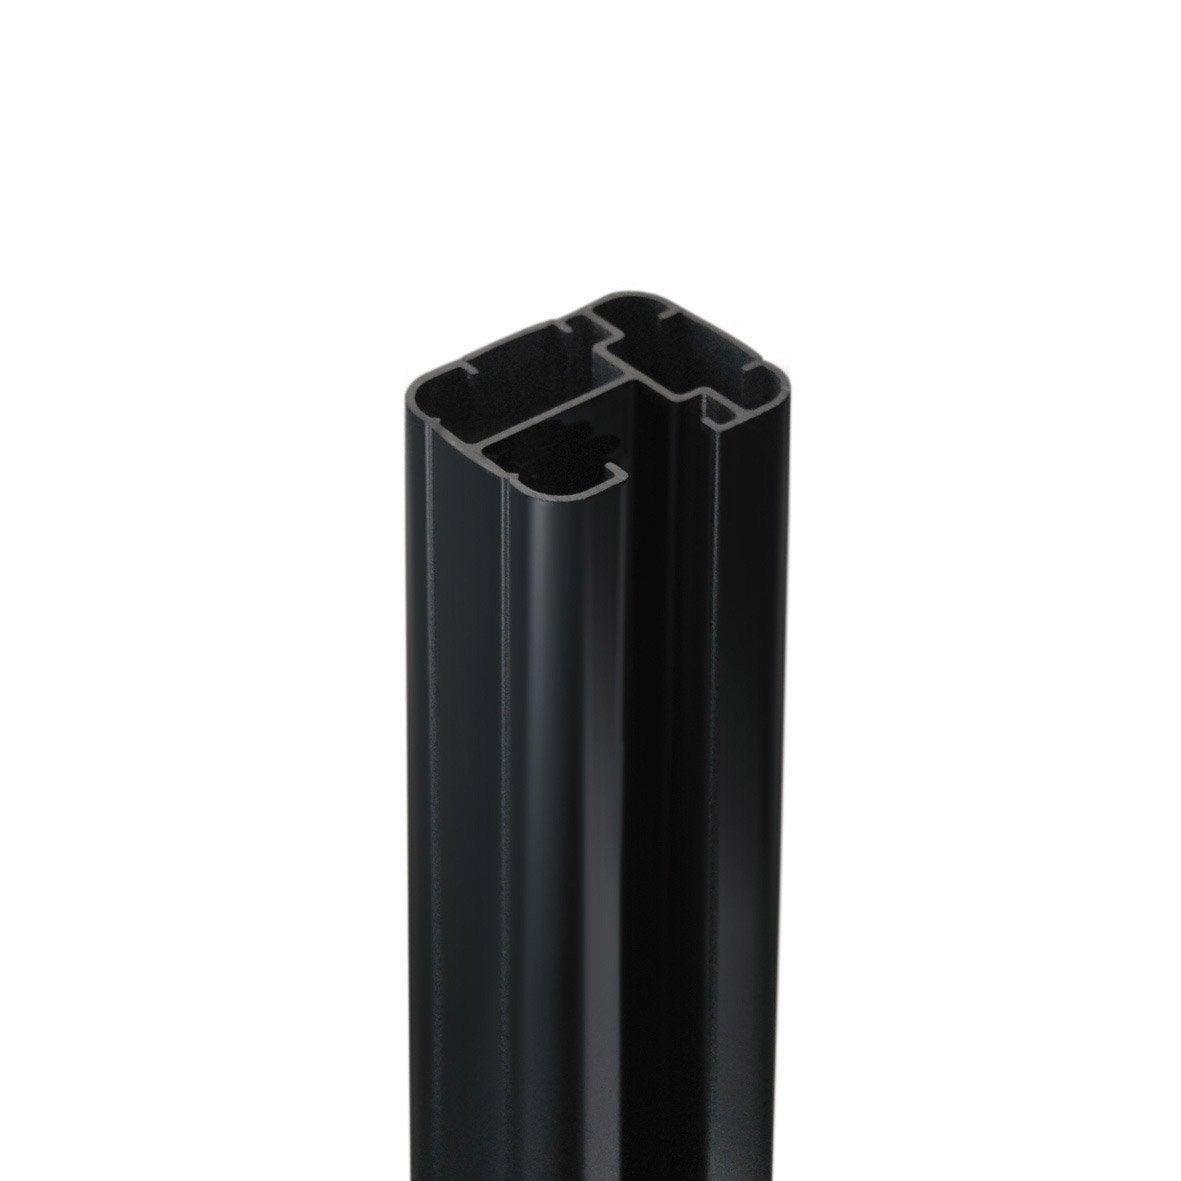 Claustra Alu Leroy Merlin poteau aluminium à sceller premium gris anthracite, h.231.5 x l.50 x p.65 cm